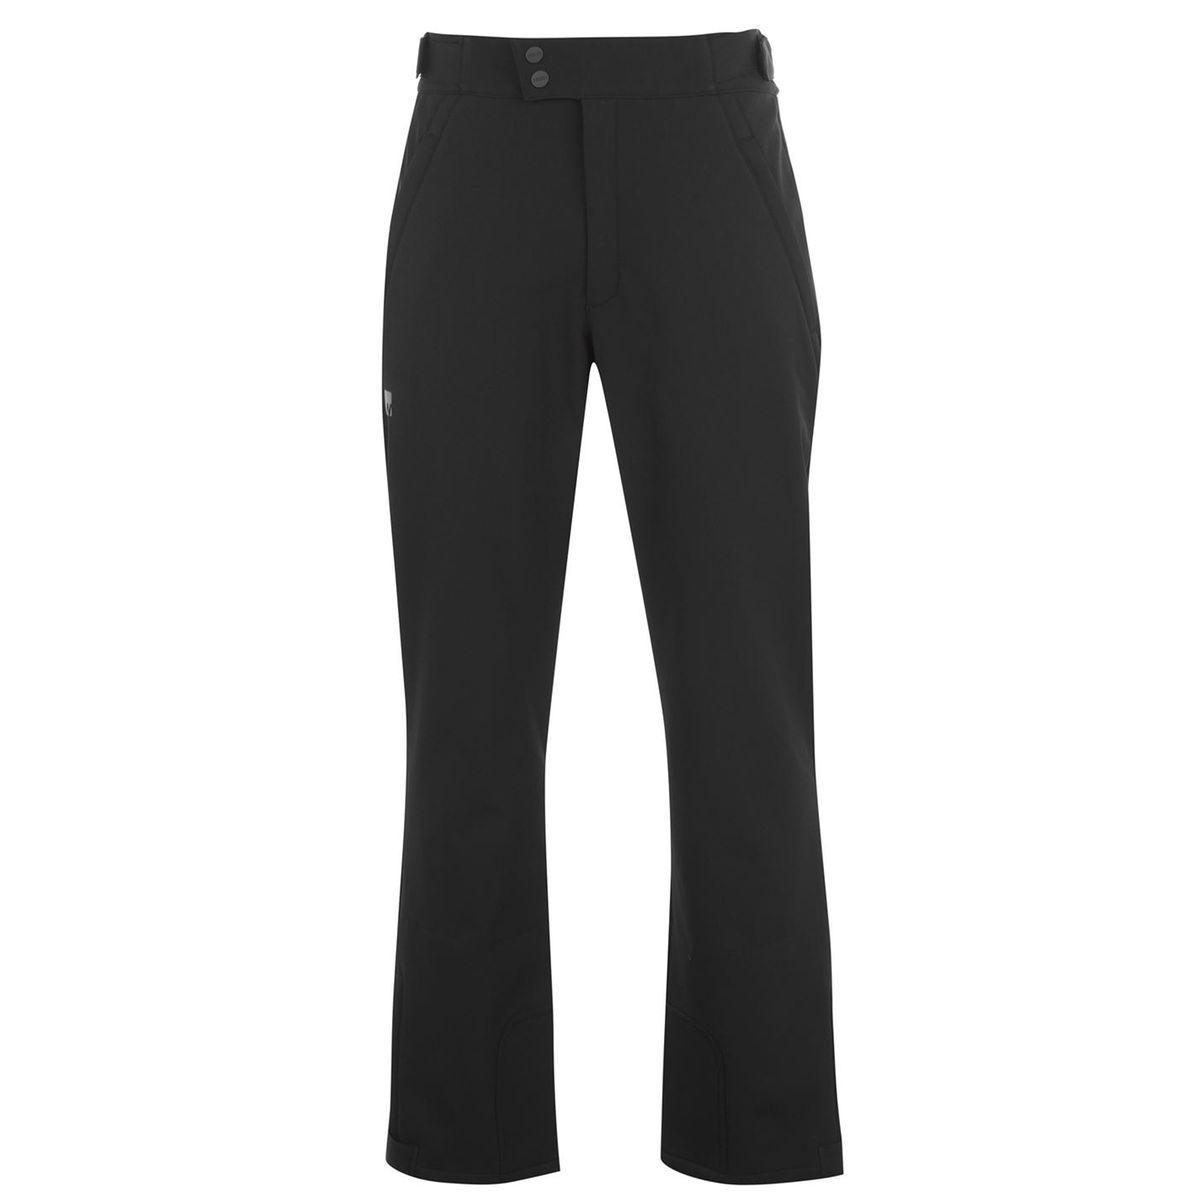 Pantalon de ski imperméable